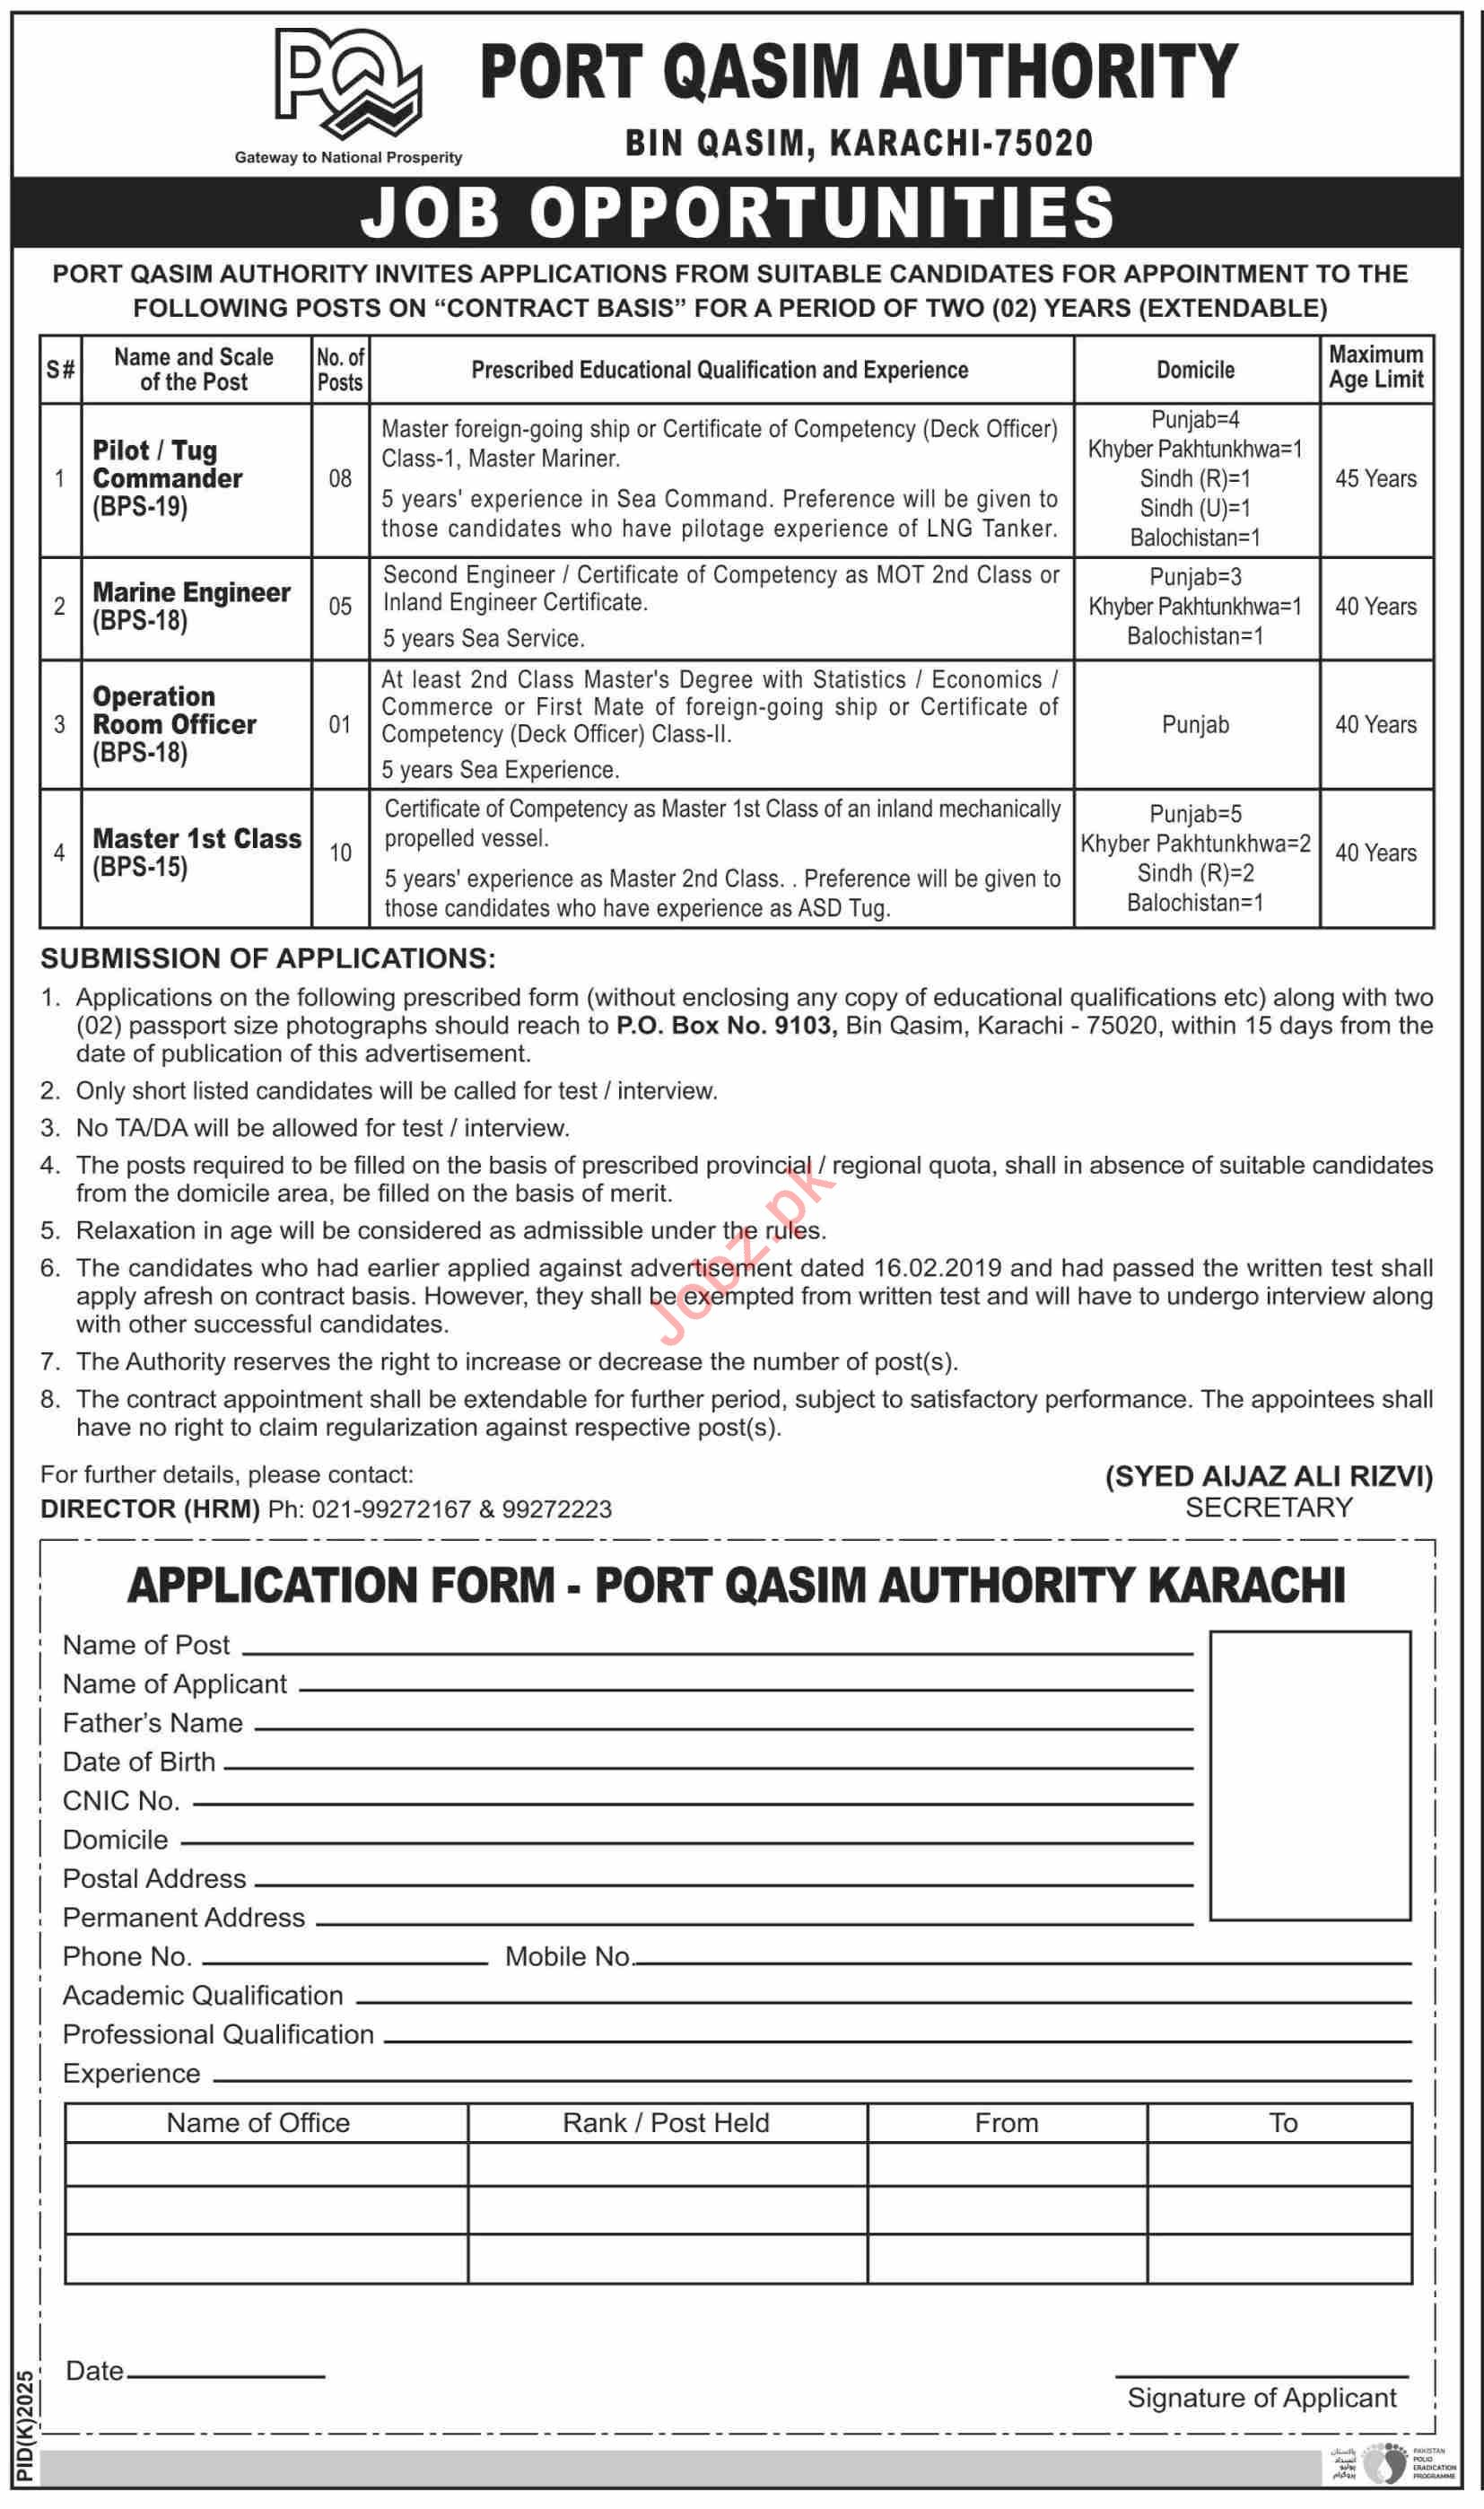 Port Qasim Authority PQA Karachi Jobs 2019 for Tug Commander